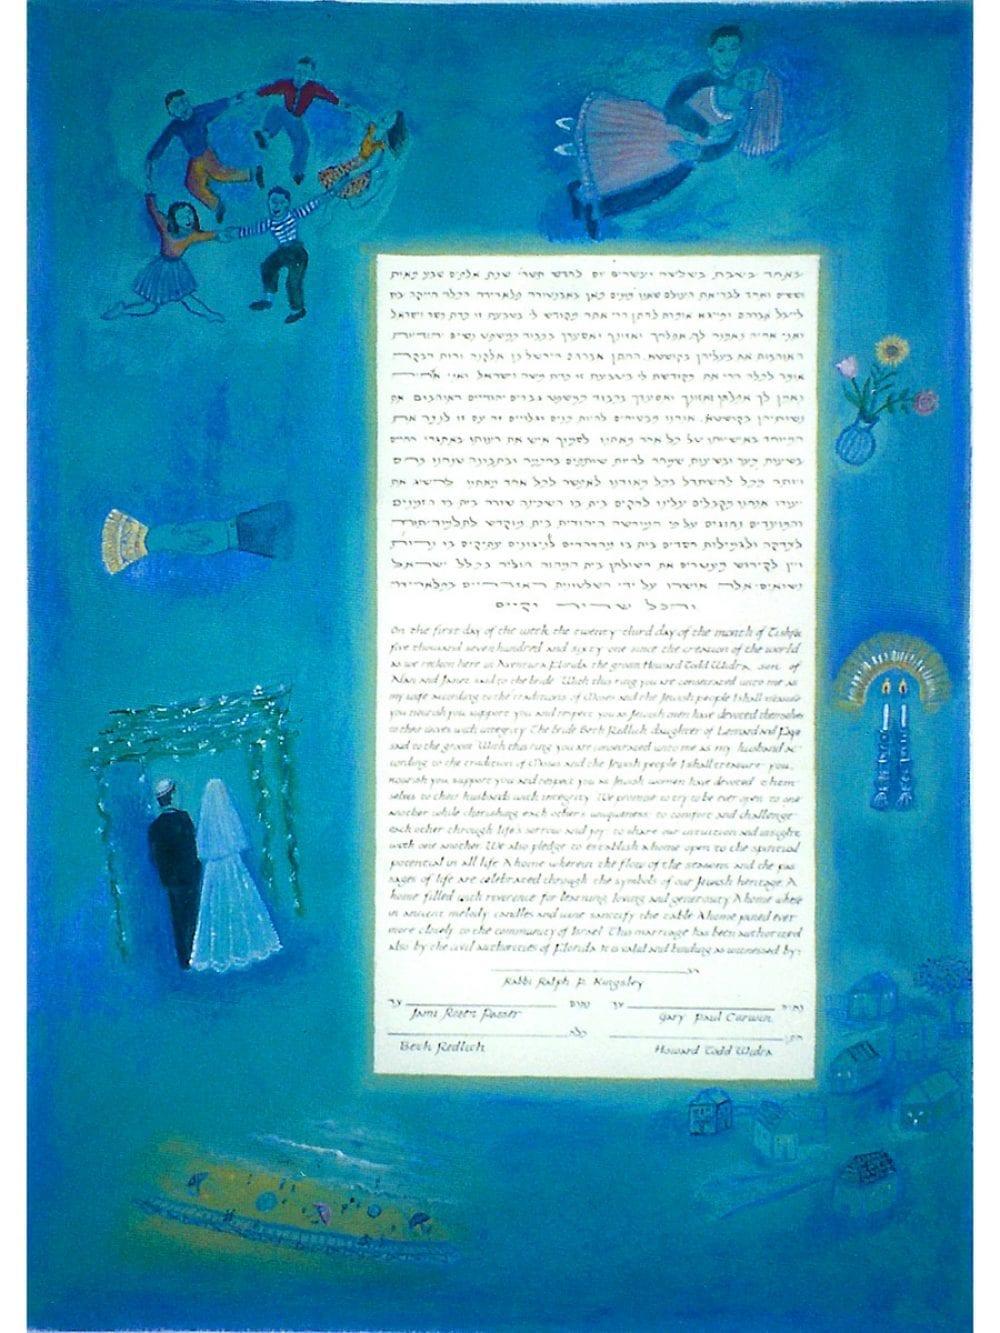 chagall-shtetl-ketubah